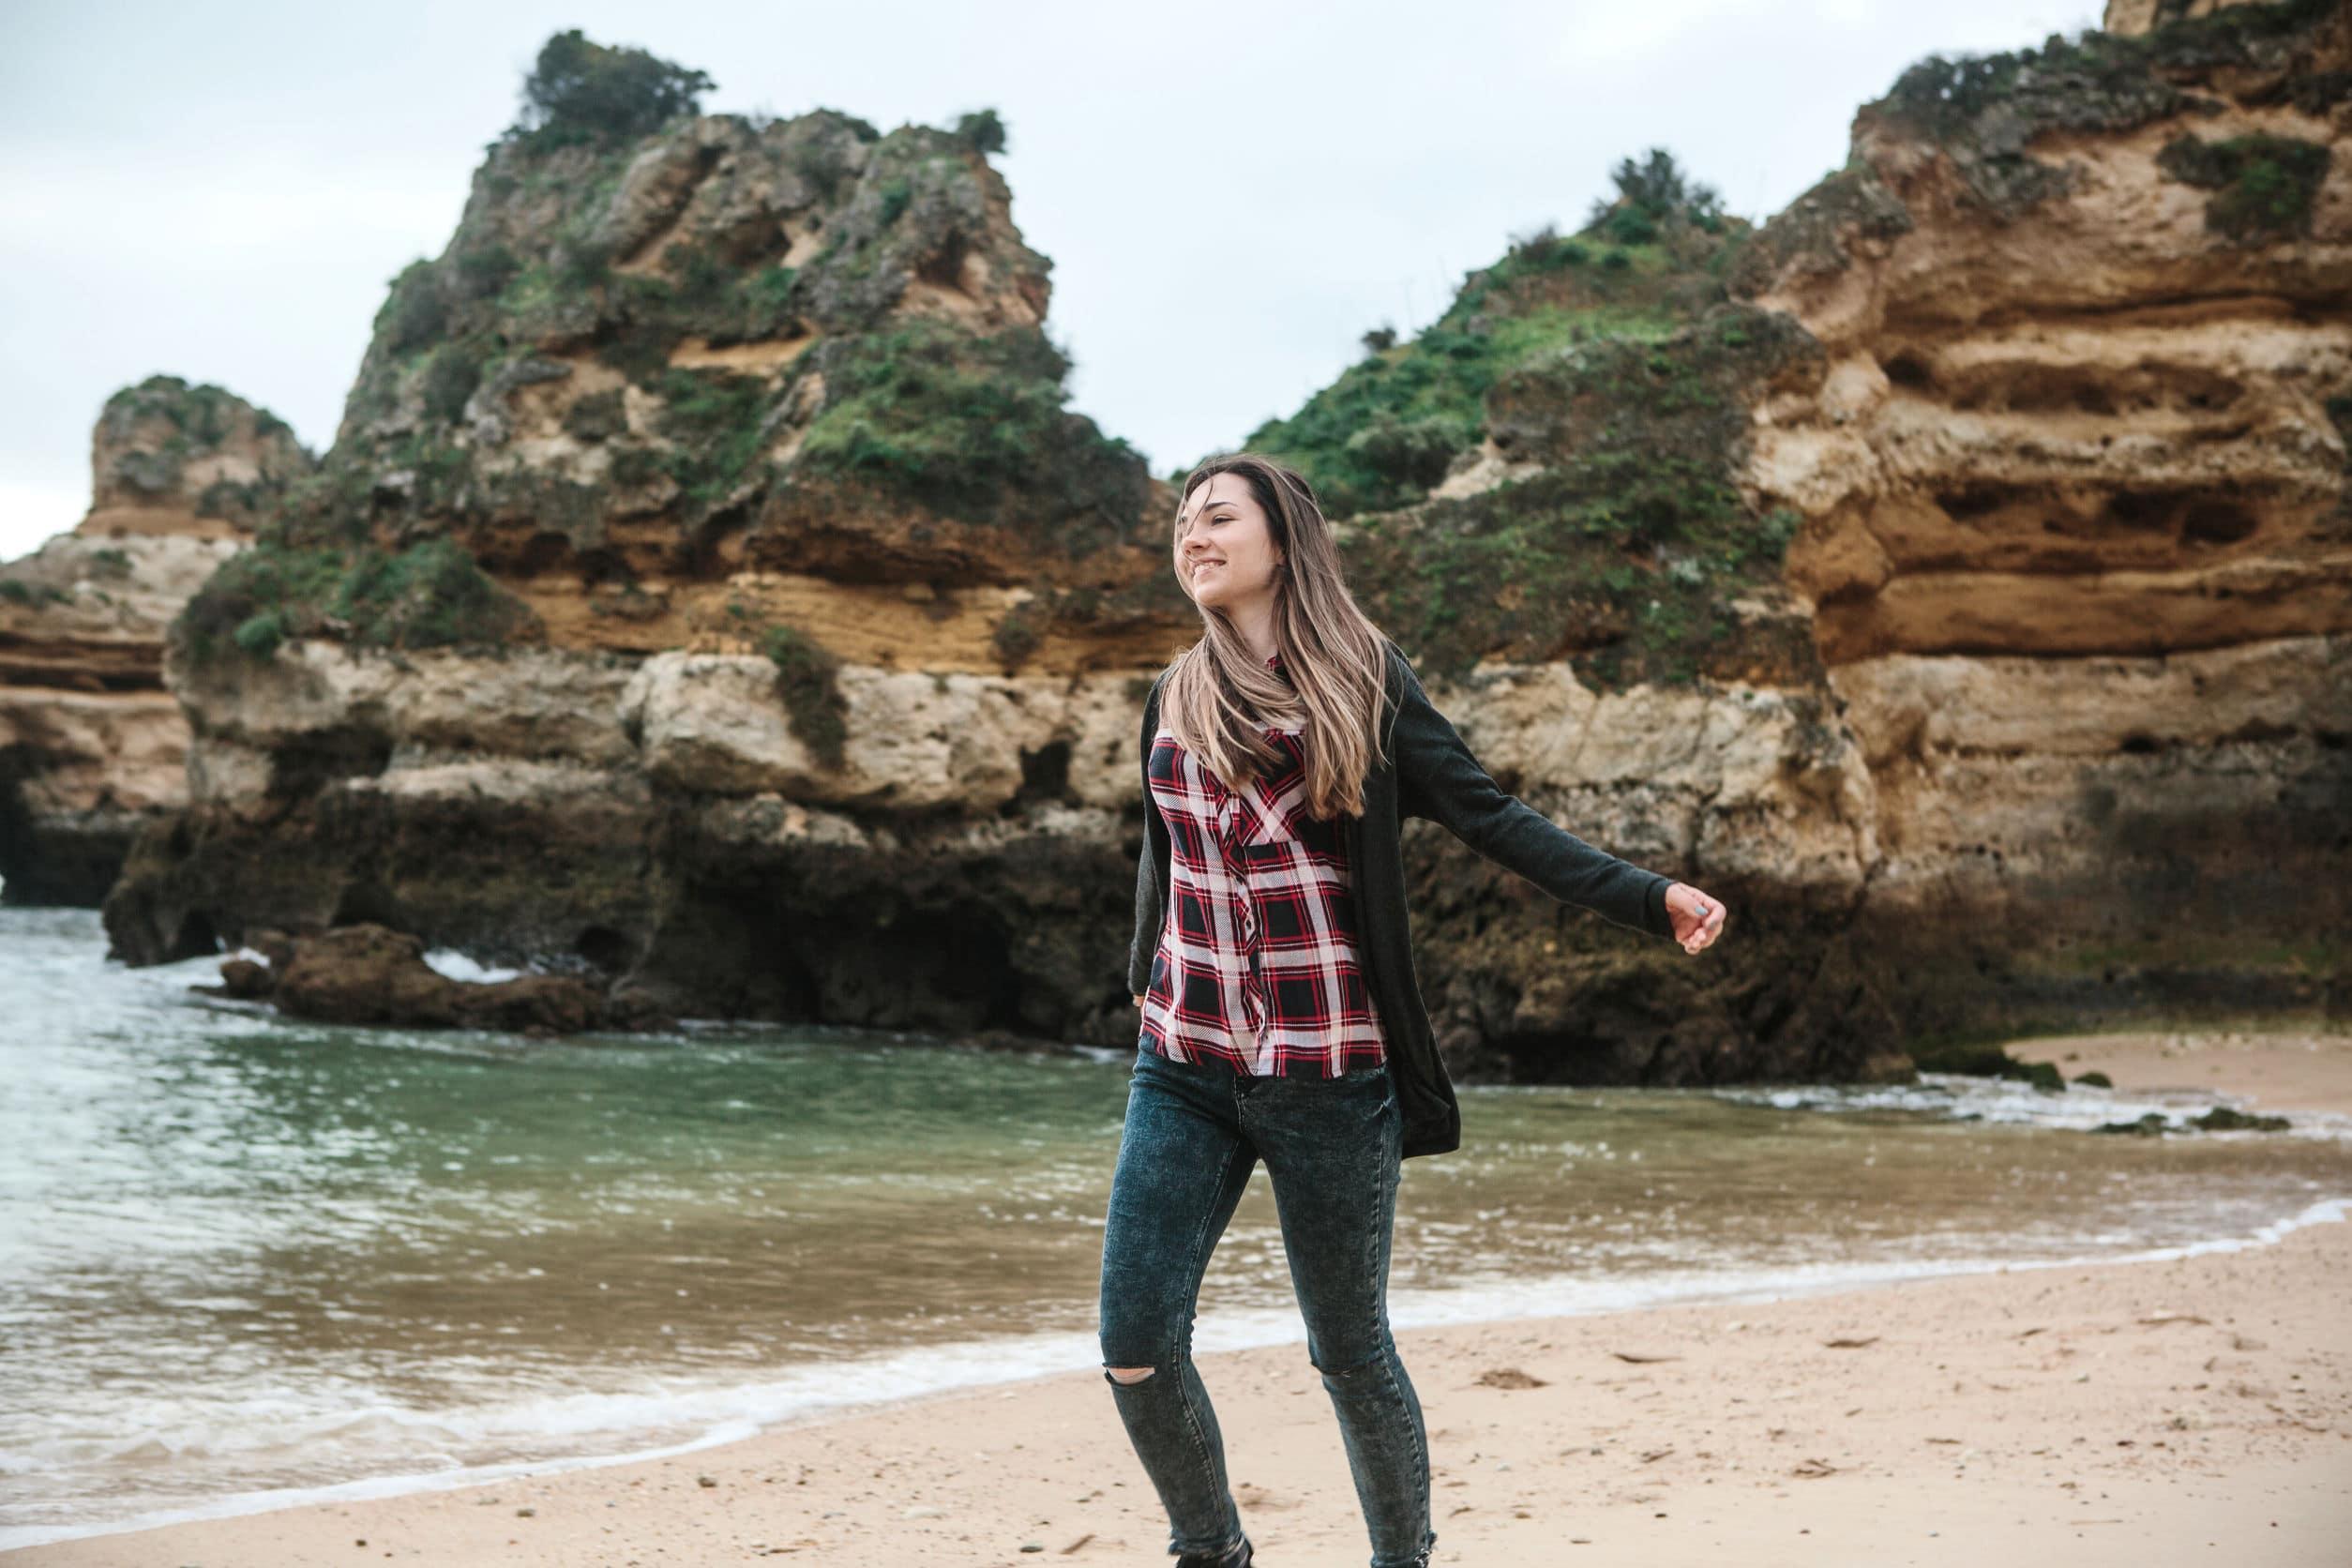 Menina branca correndo de braços abertos sorridente pela praia